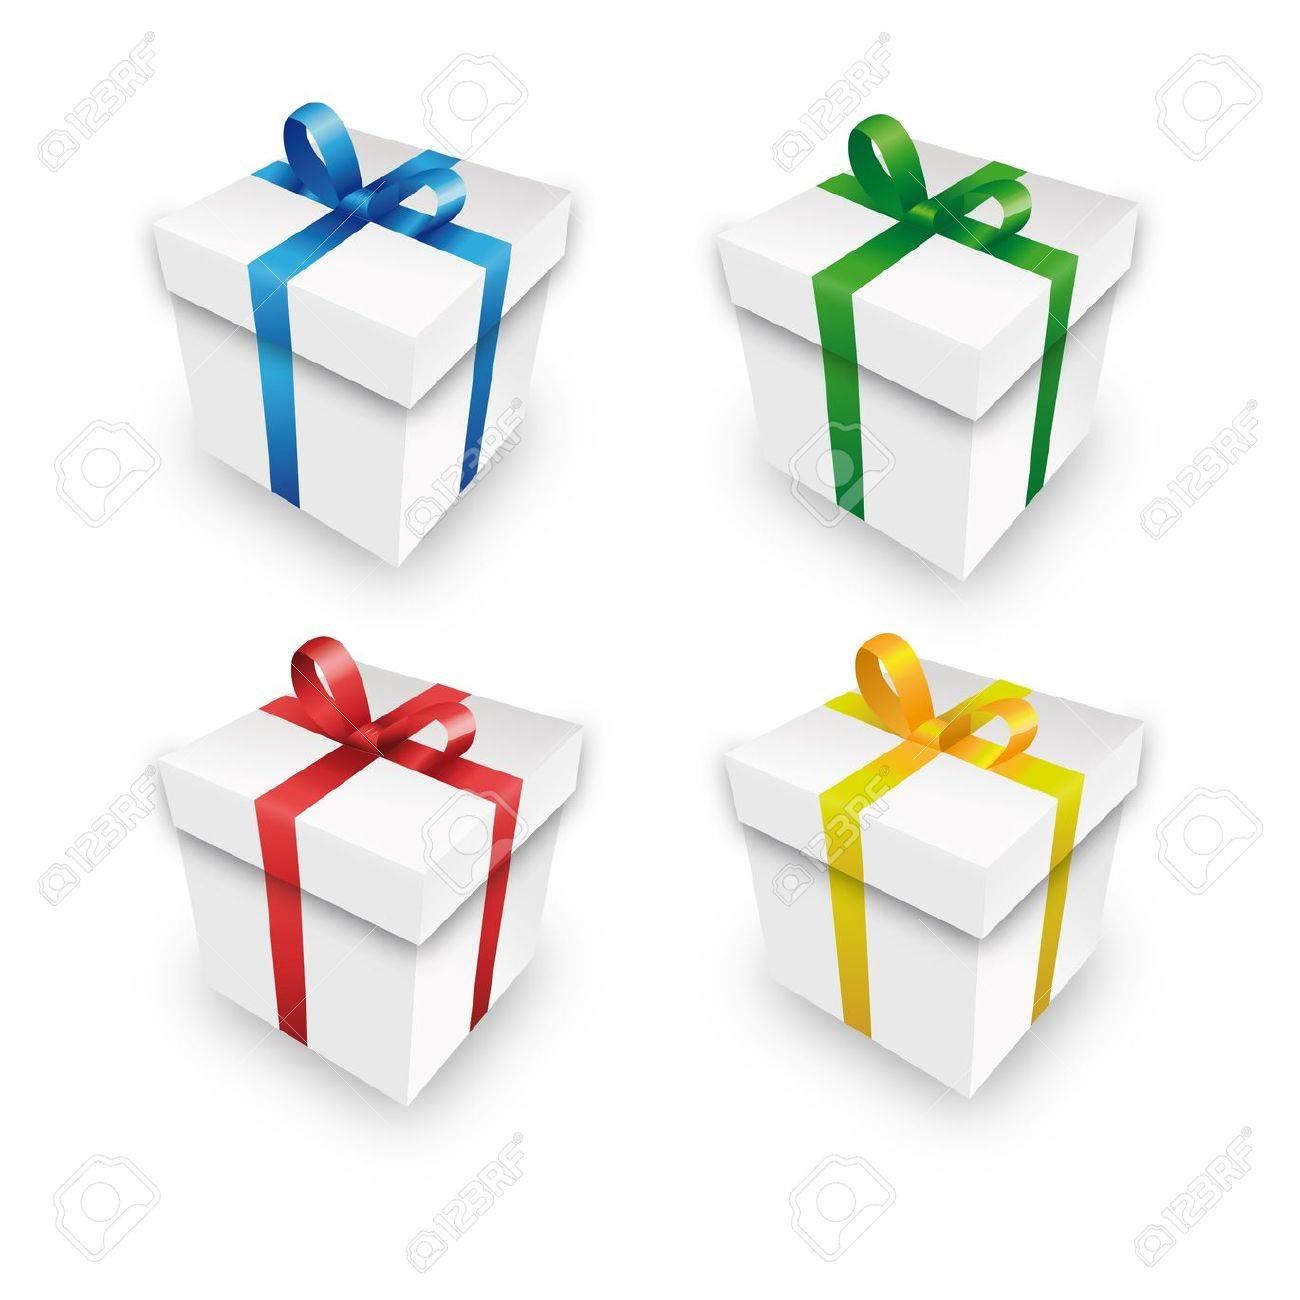 Geschenk Paket Geschenk Box Set Rot Packchen Verpackung Weihnachten